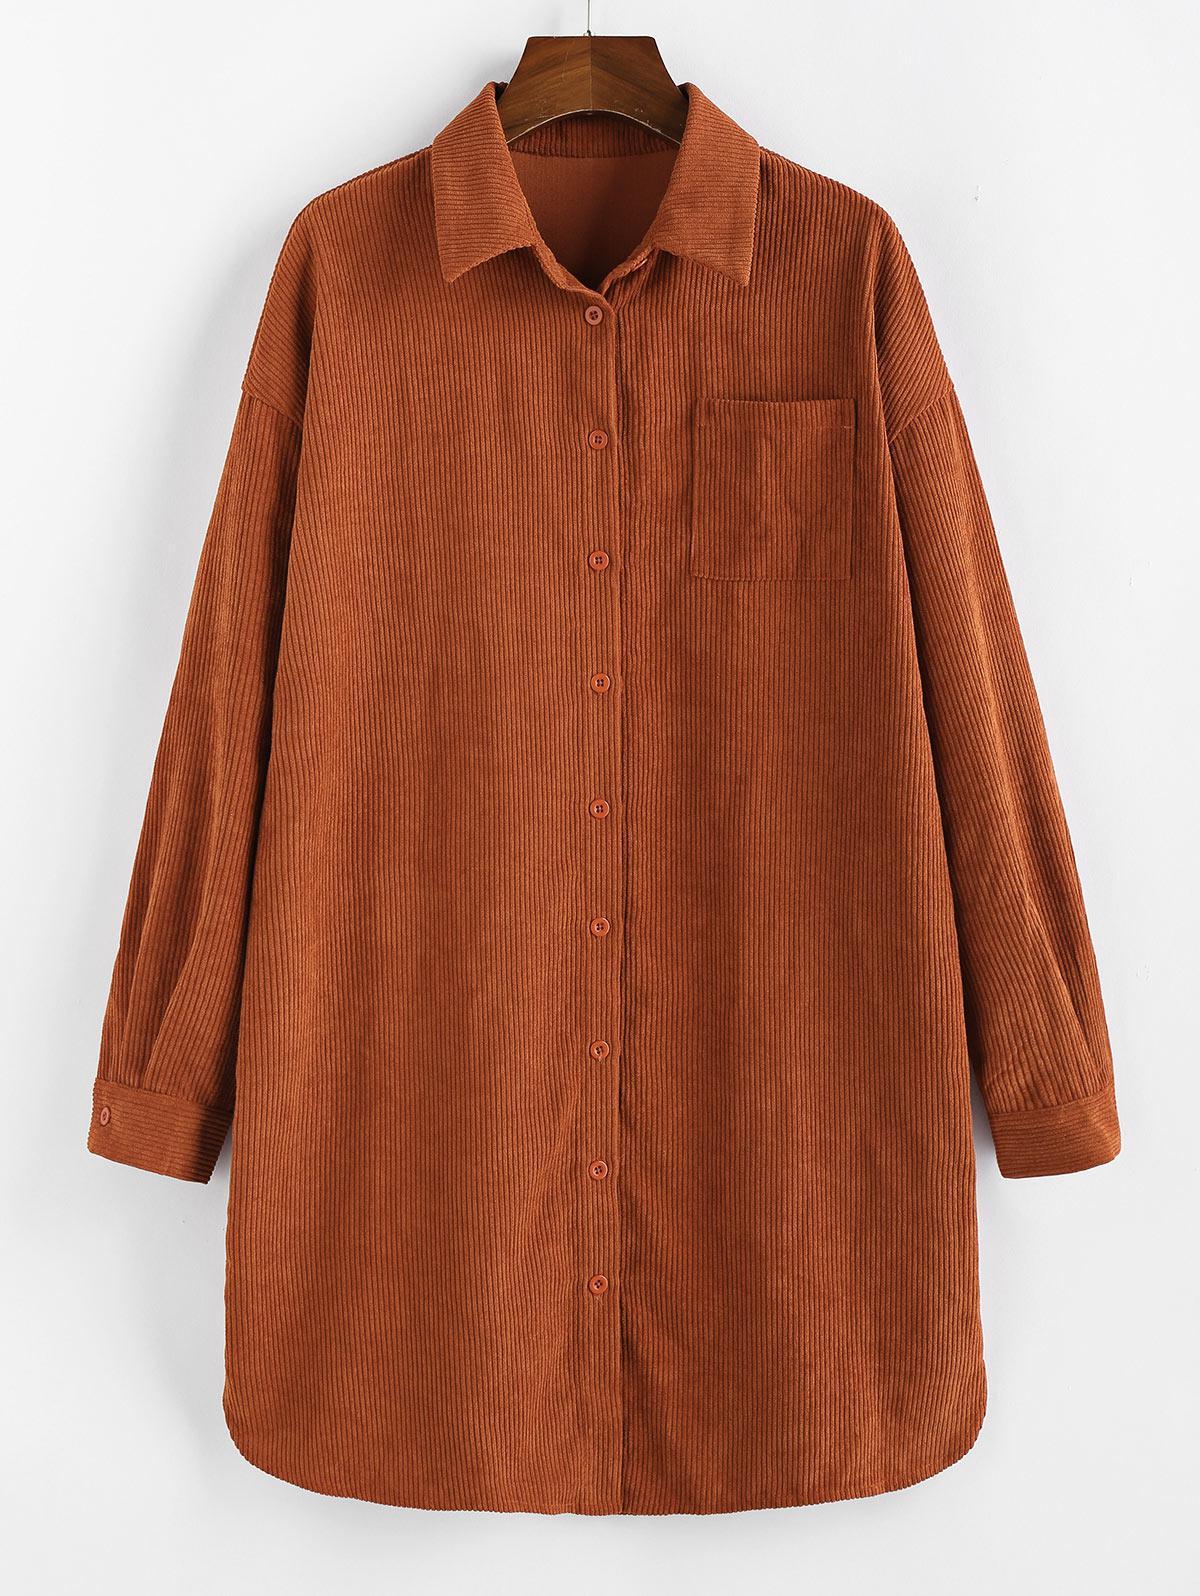 ZAFUL Corduroy Patched Pocket Straight Shirt Dress фото